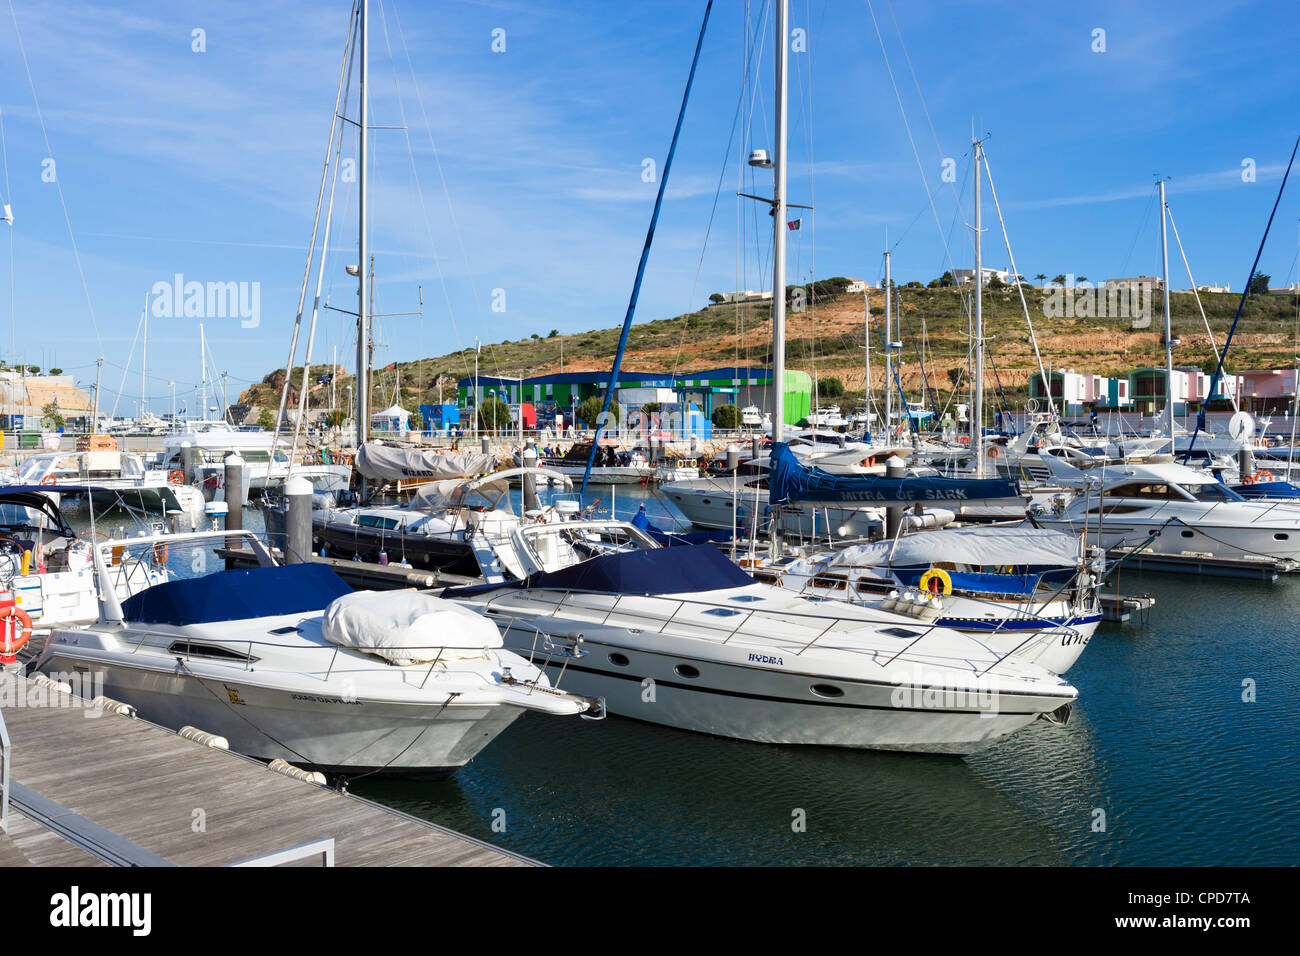 Boote in der Marina, Albufeira, Algarve, Portugal Stockbild